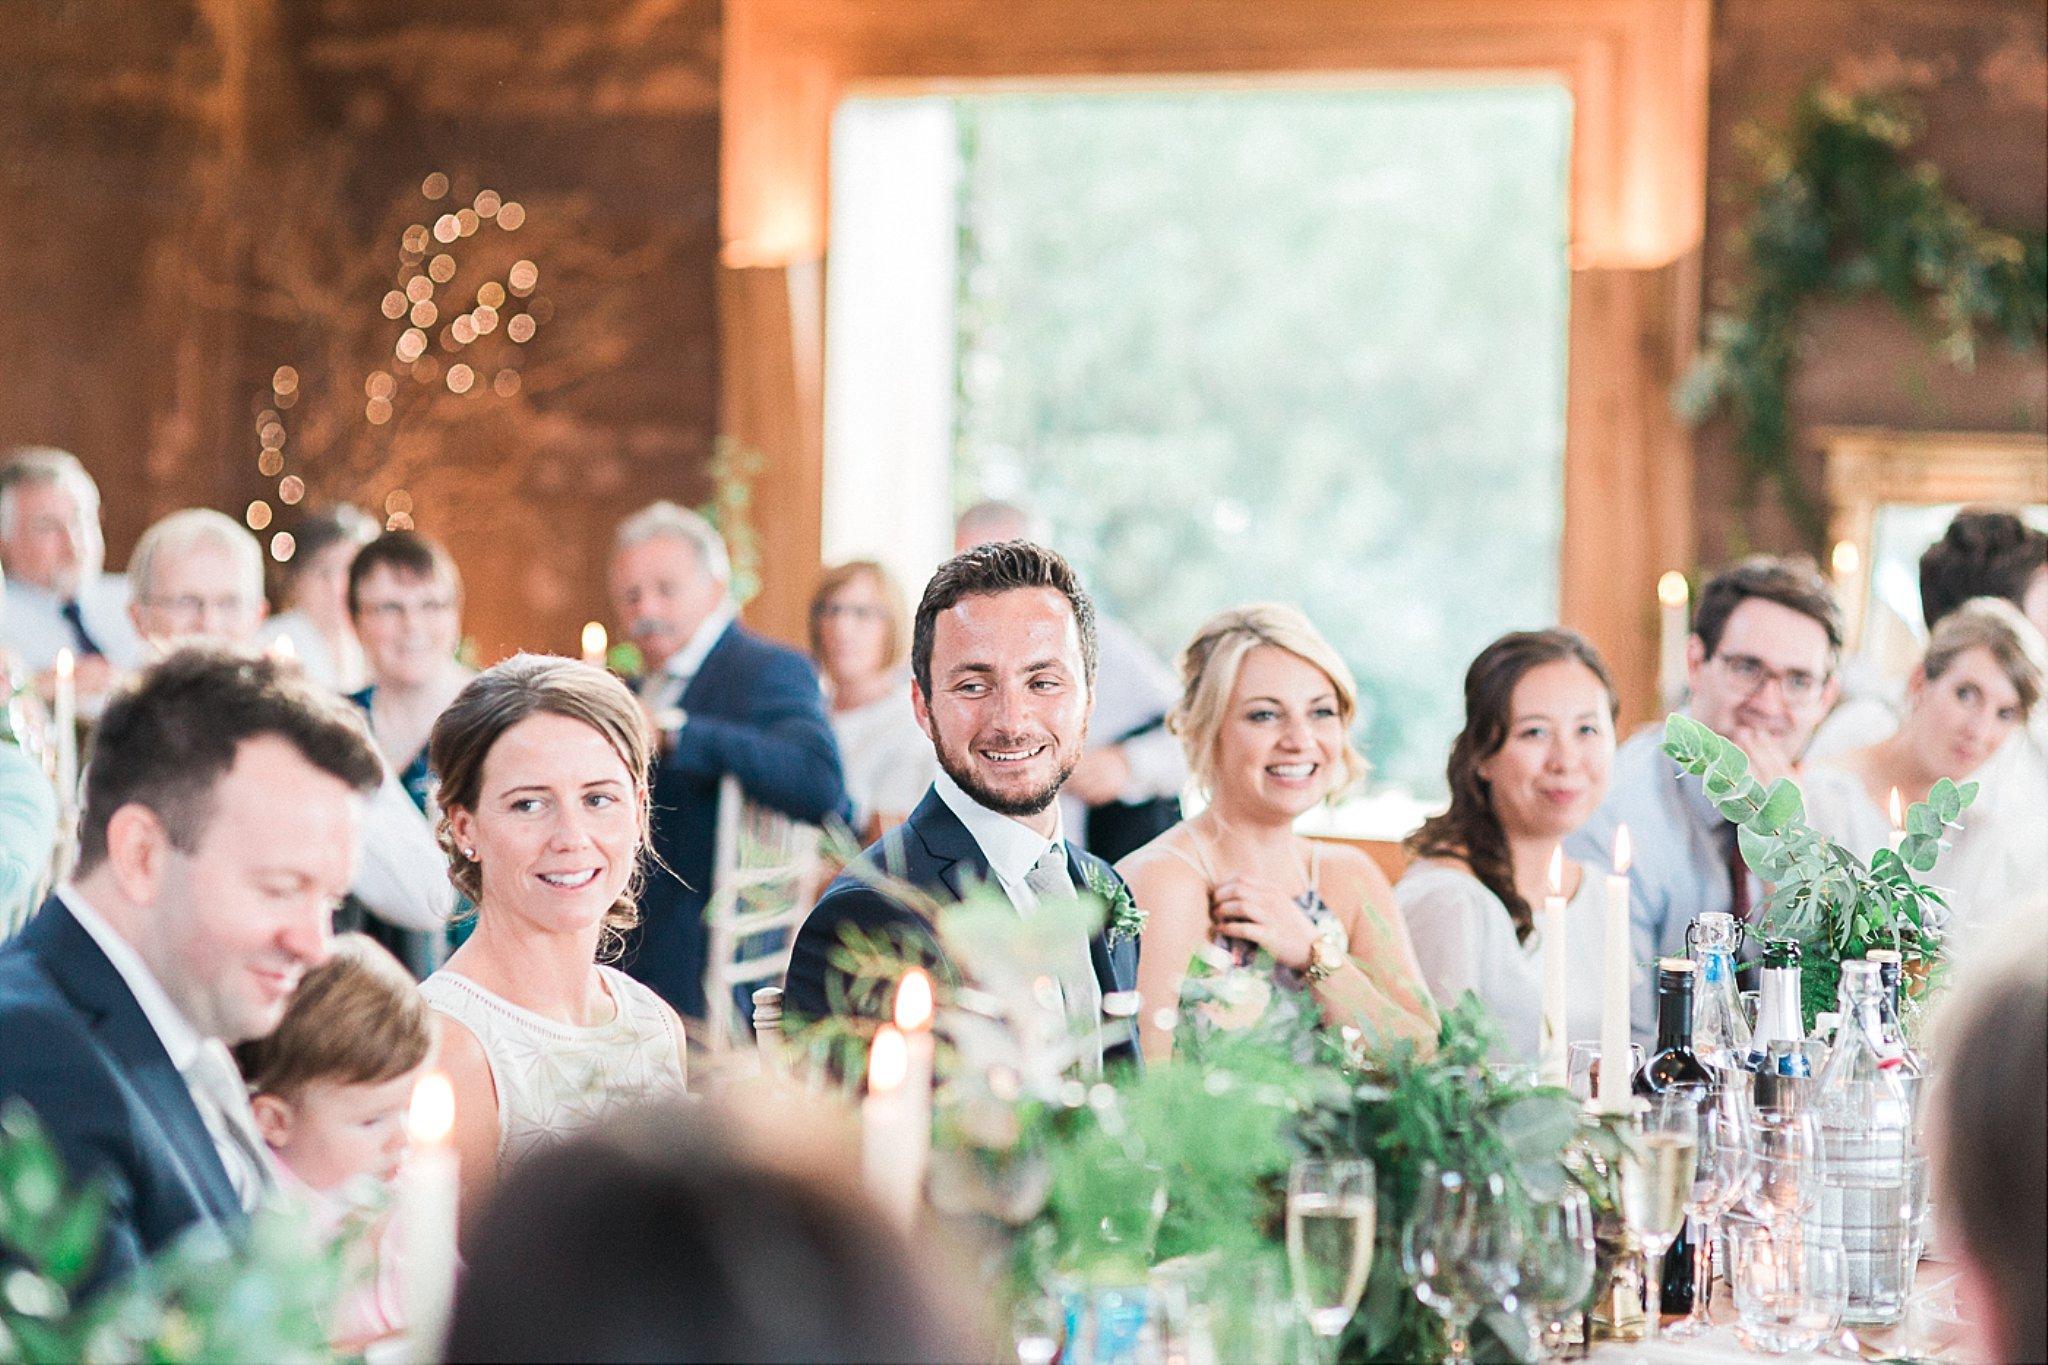 Cotswolds Wedding,Cotswolds Wedding Photographer,Destination Wedding Photographer,Elmore Court Wedding,Elmore Court Wedding Photographer,Fine Art Wedding Photographer,Kylee Yee,Kylee Yee Photography,London Wedding Photographer,UK Fine Art Photographer,UK Fine Art Wedding,Wedding and Portrait Photographer,